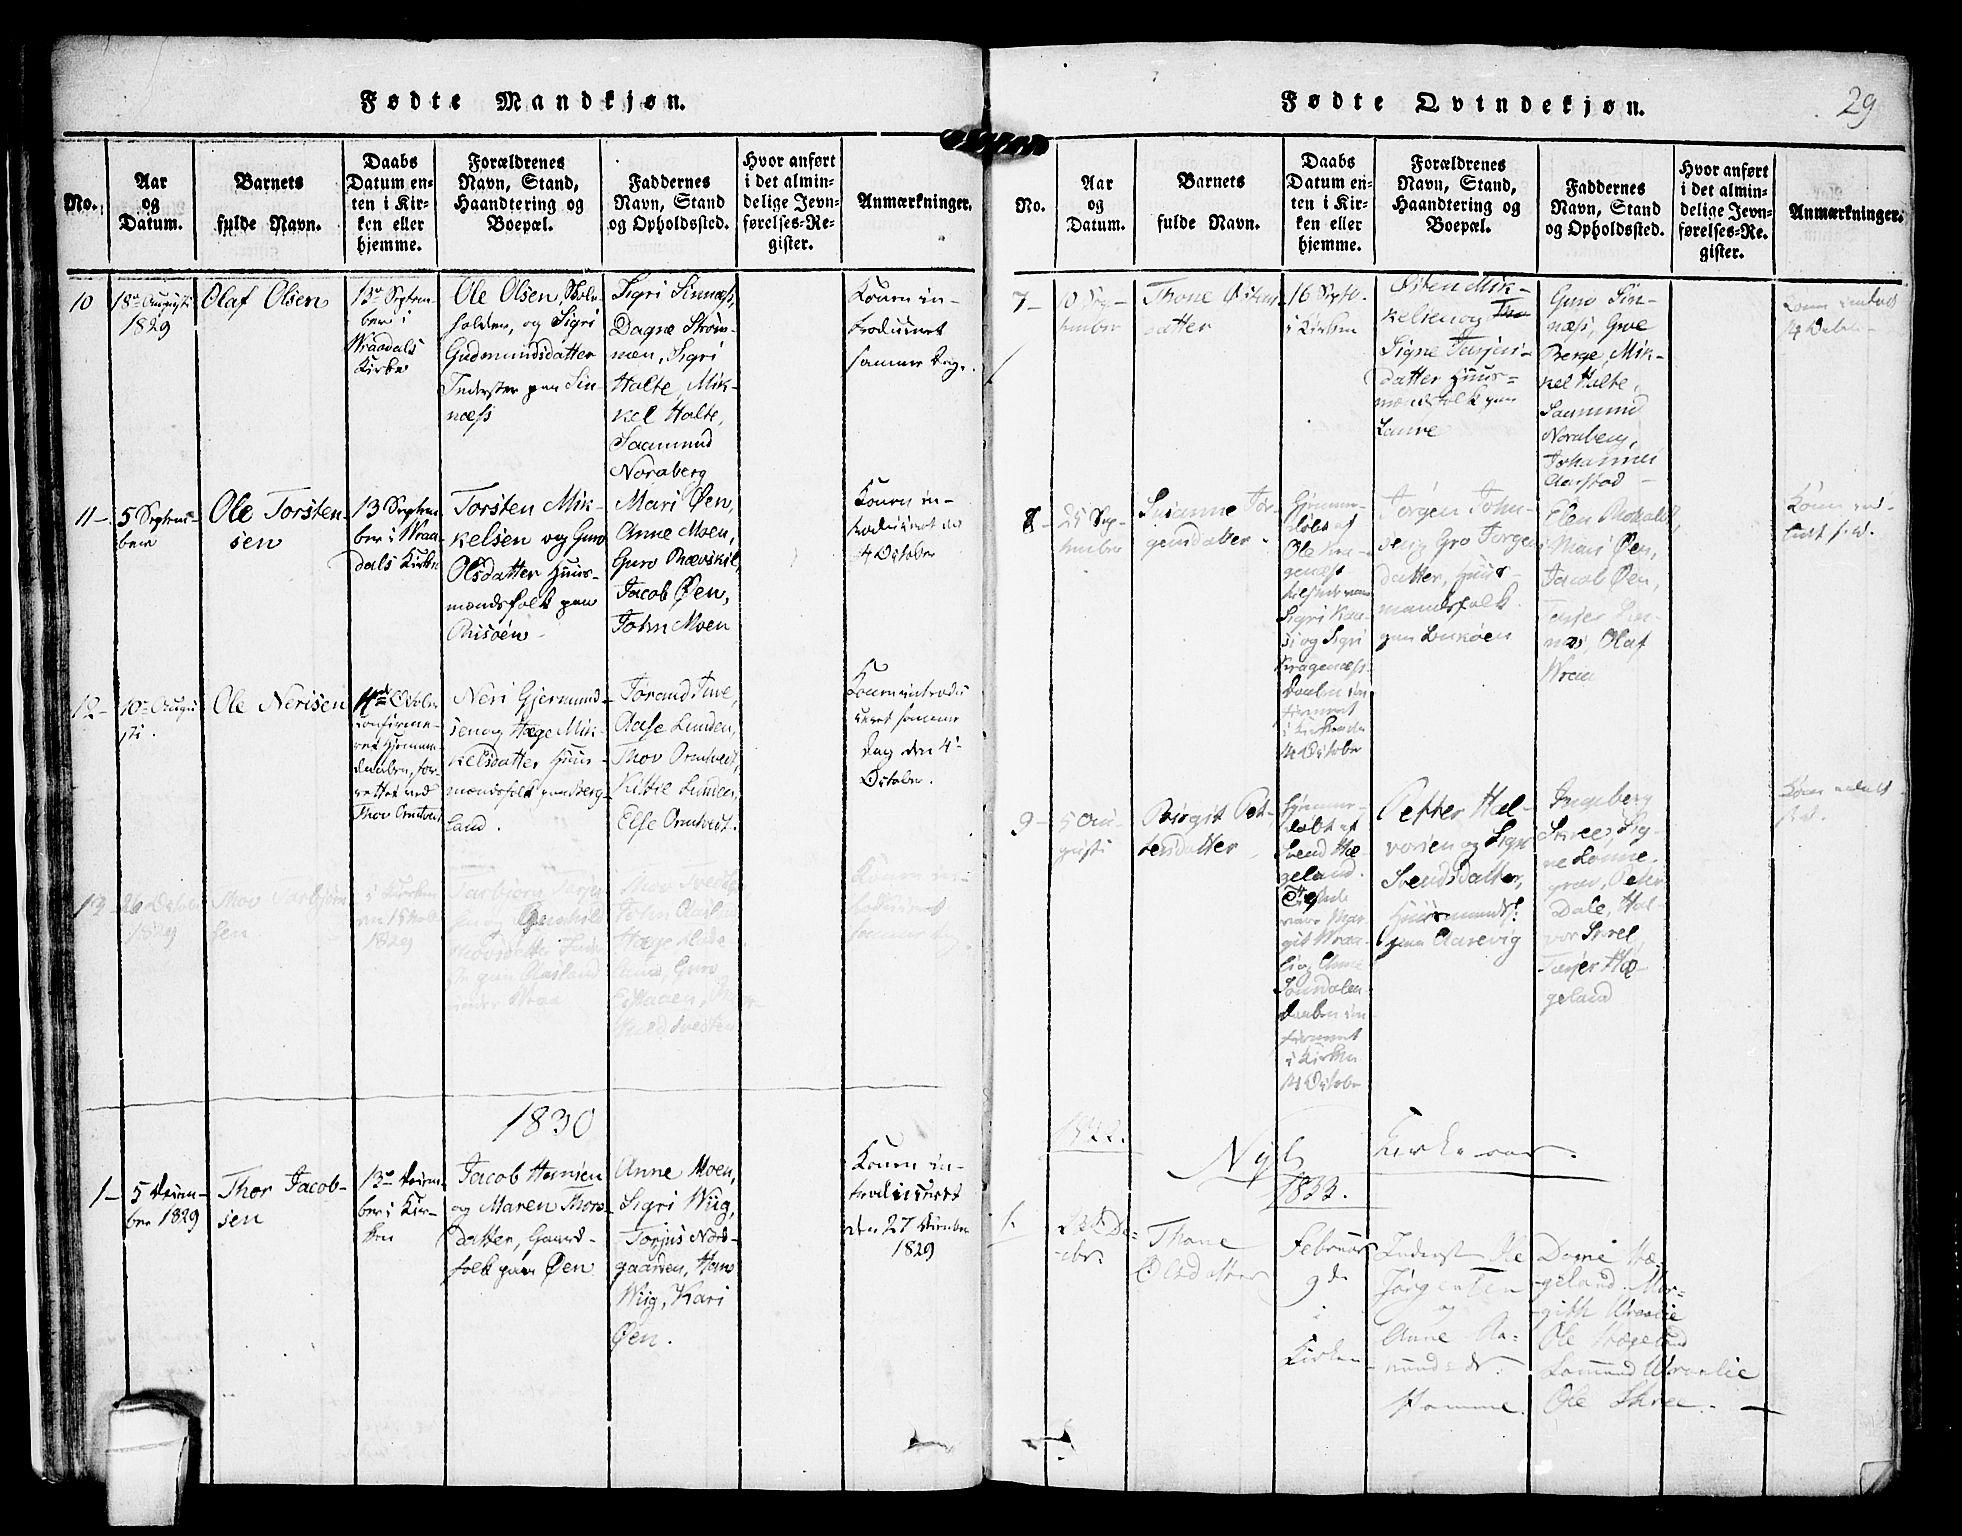 SAKO, Kviteseid kirkebøker, F/Fc/L0001: Ministerialbok nr. III 1, 1815-1836, s. 29